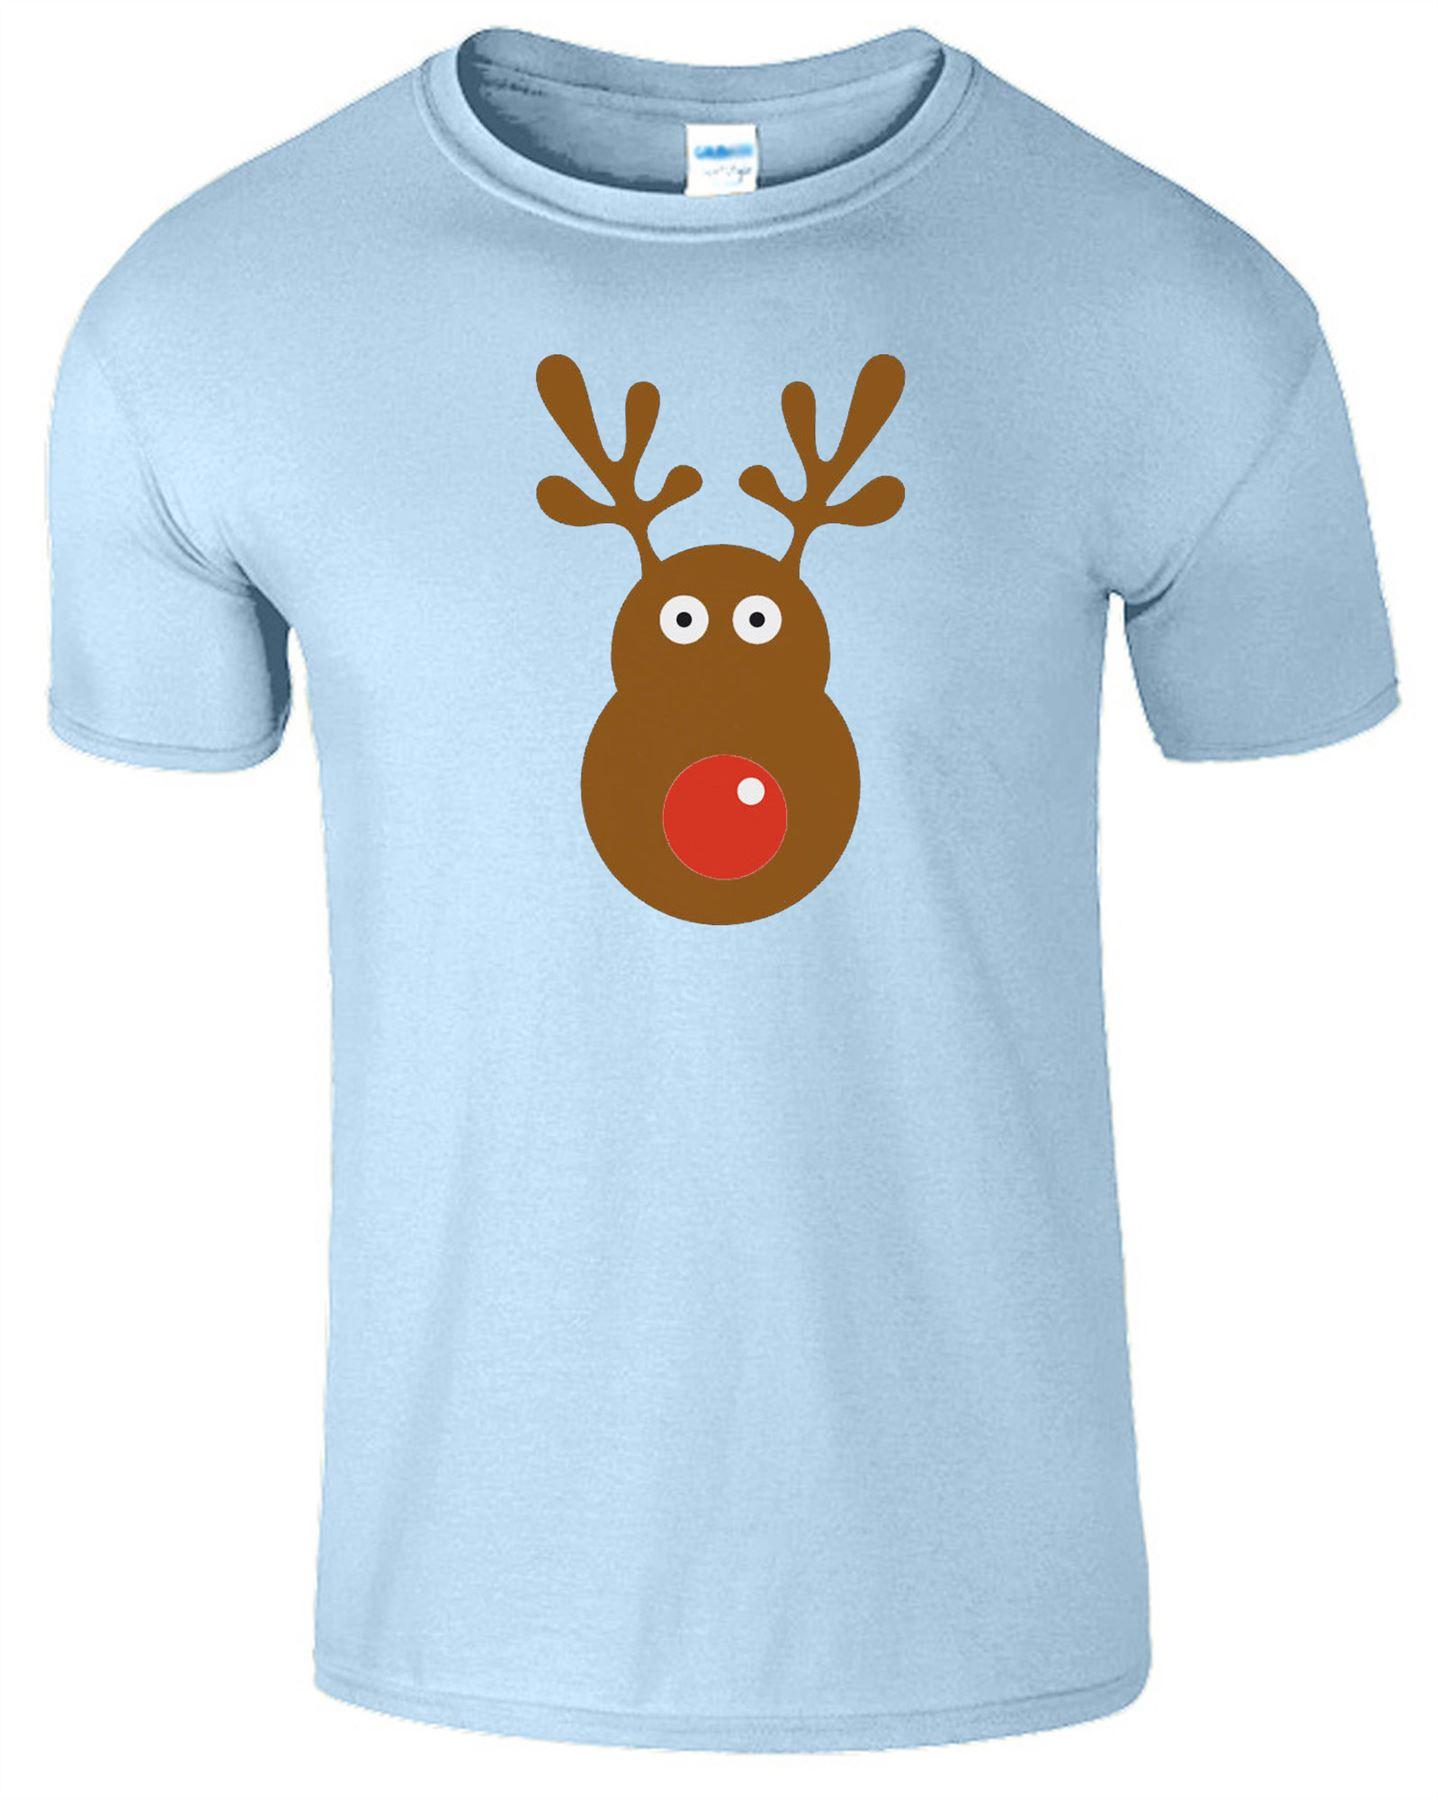 RUDOLPH REINDEER Kids Christmas T Shirt Xmas Novelty Funny Face Tee ...